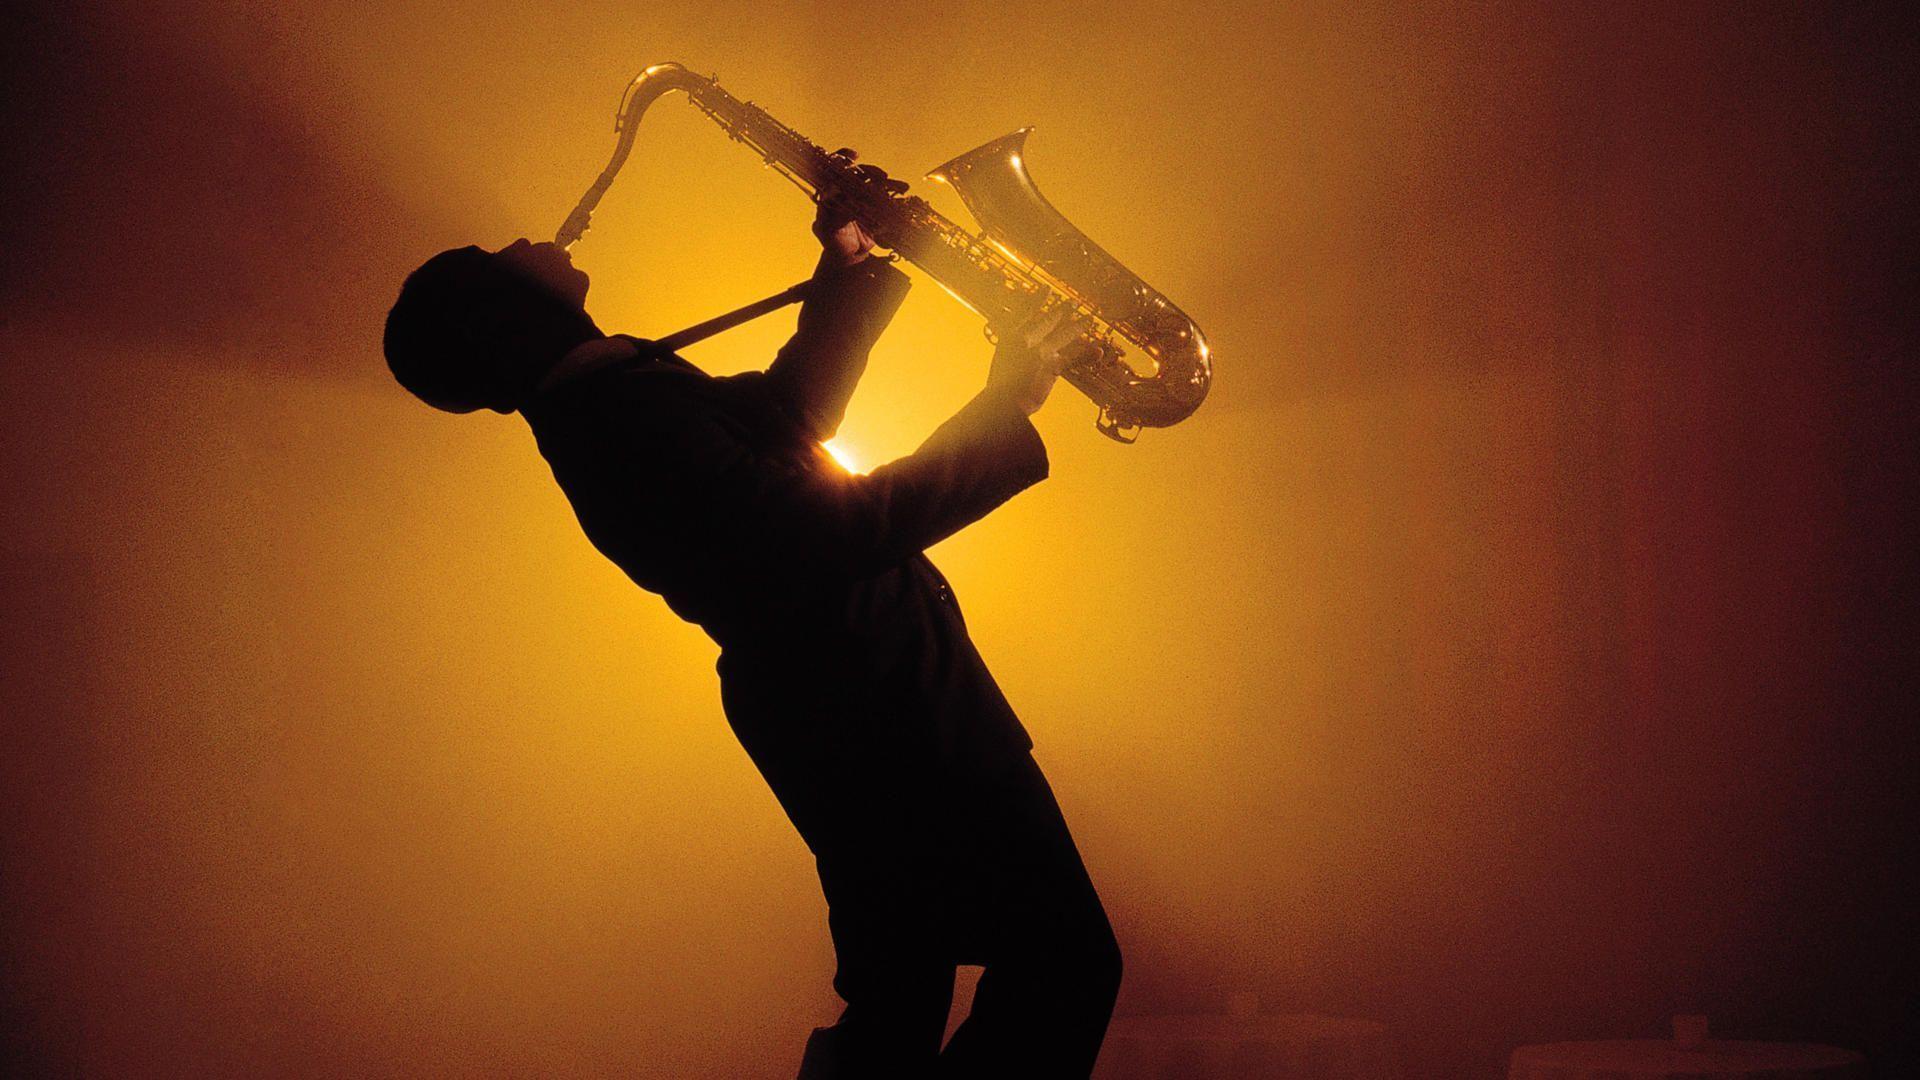 saxophone wallpaper-OmQT | Explore Buxton Derbyshire